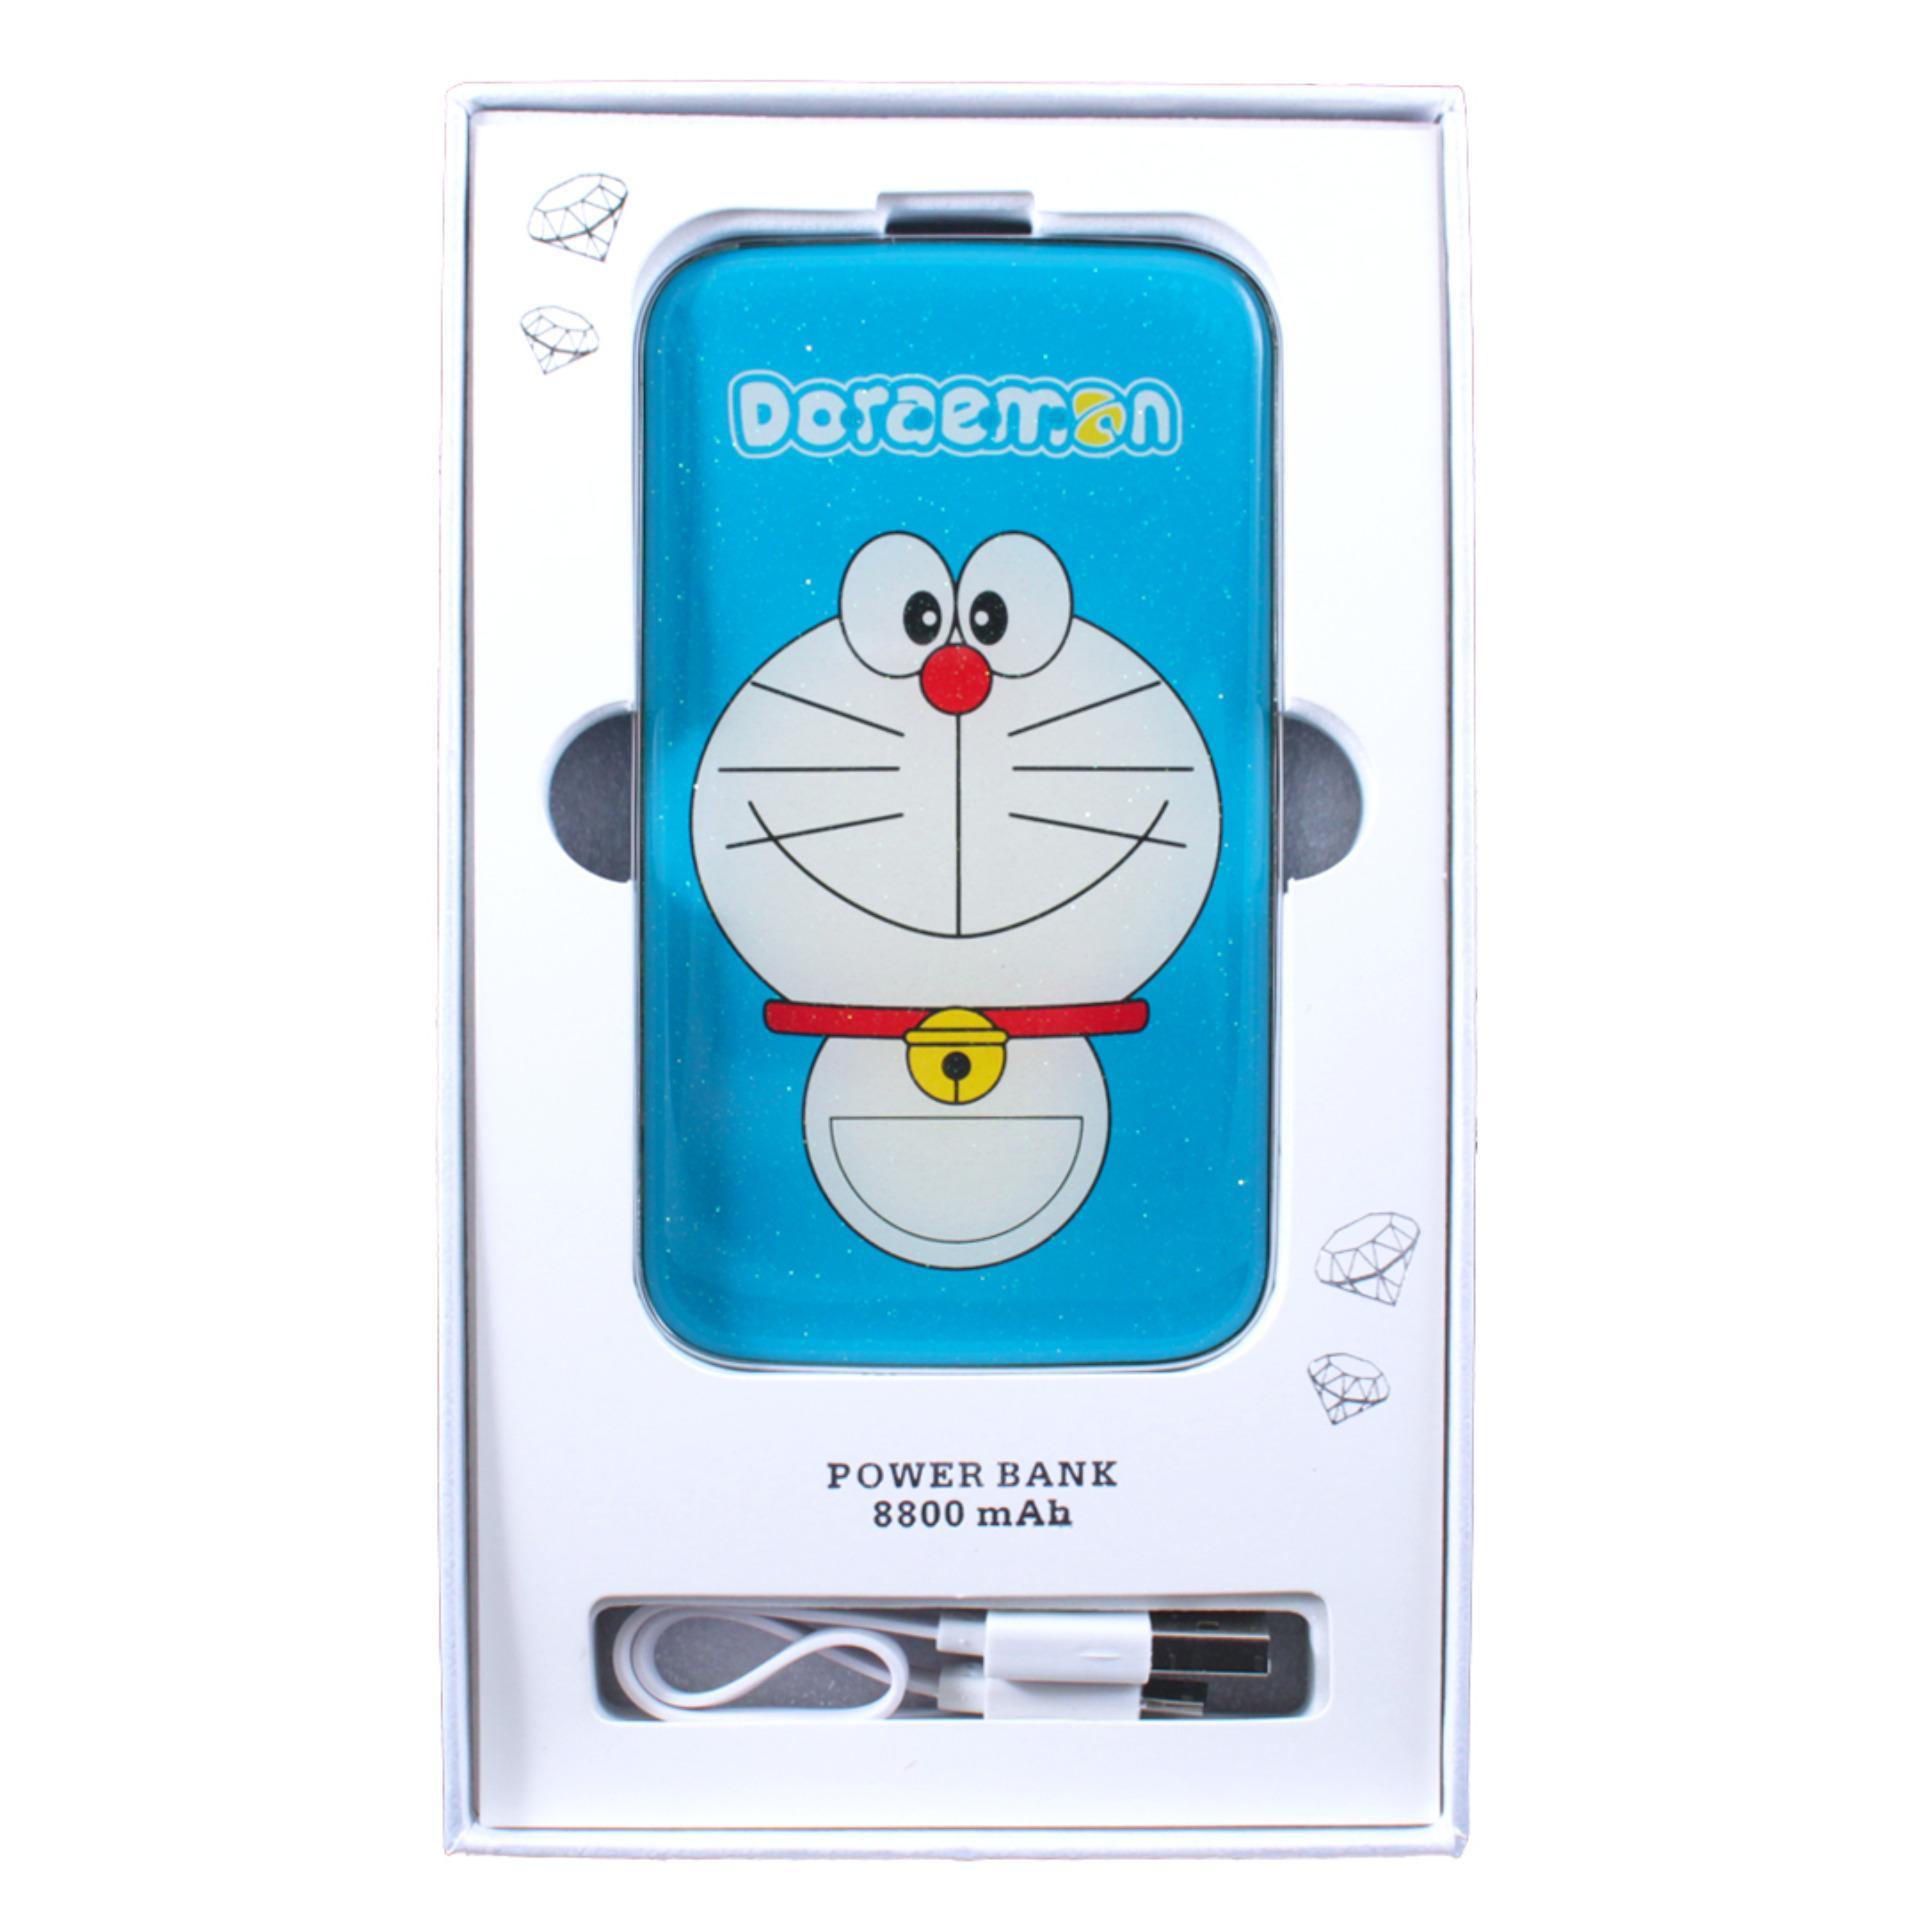 Powerbank Karakter Doraemon Slim; Powerbank Karakter Doraemon Slim ...